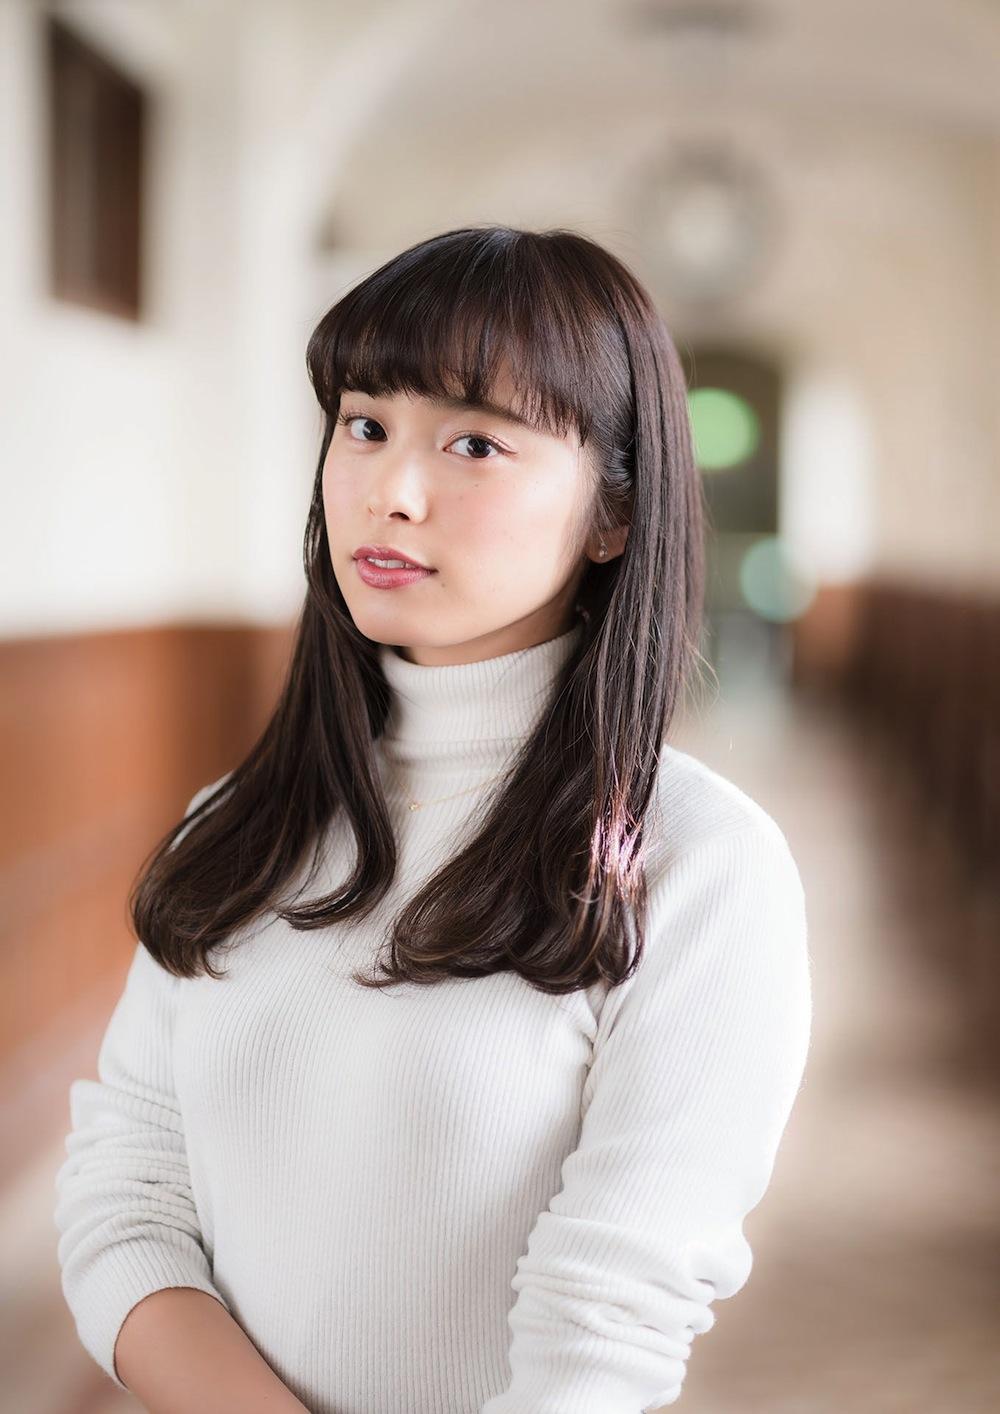 内田侑希・上智大学総合グローバル学部4年